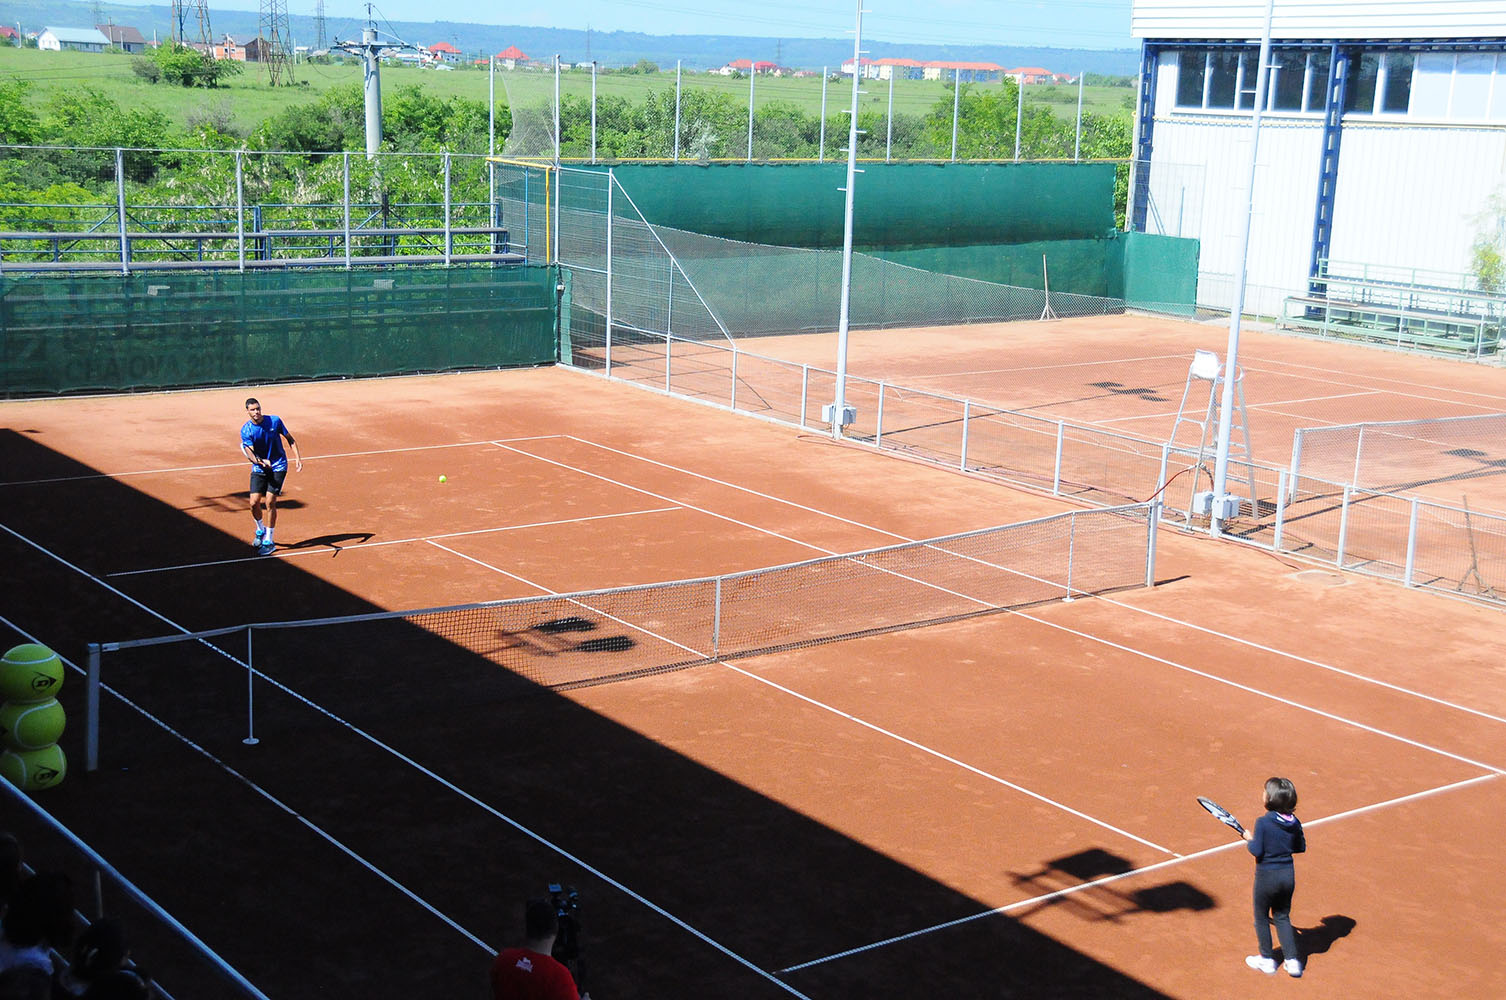 2 jucatori de tenis pe un teren de zgura